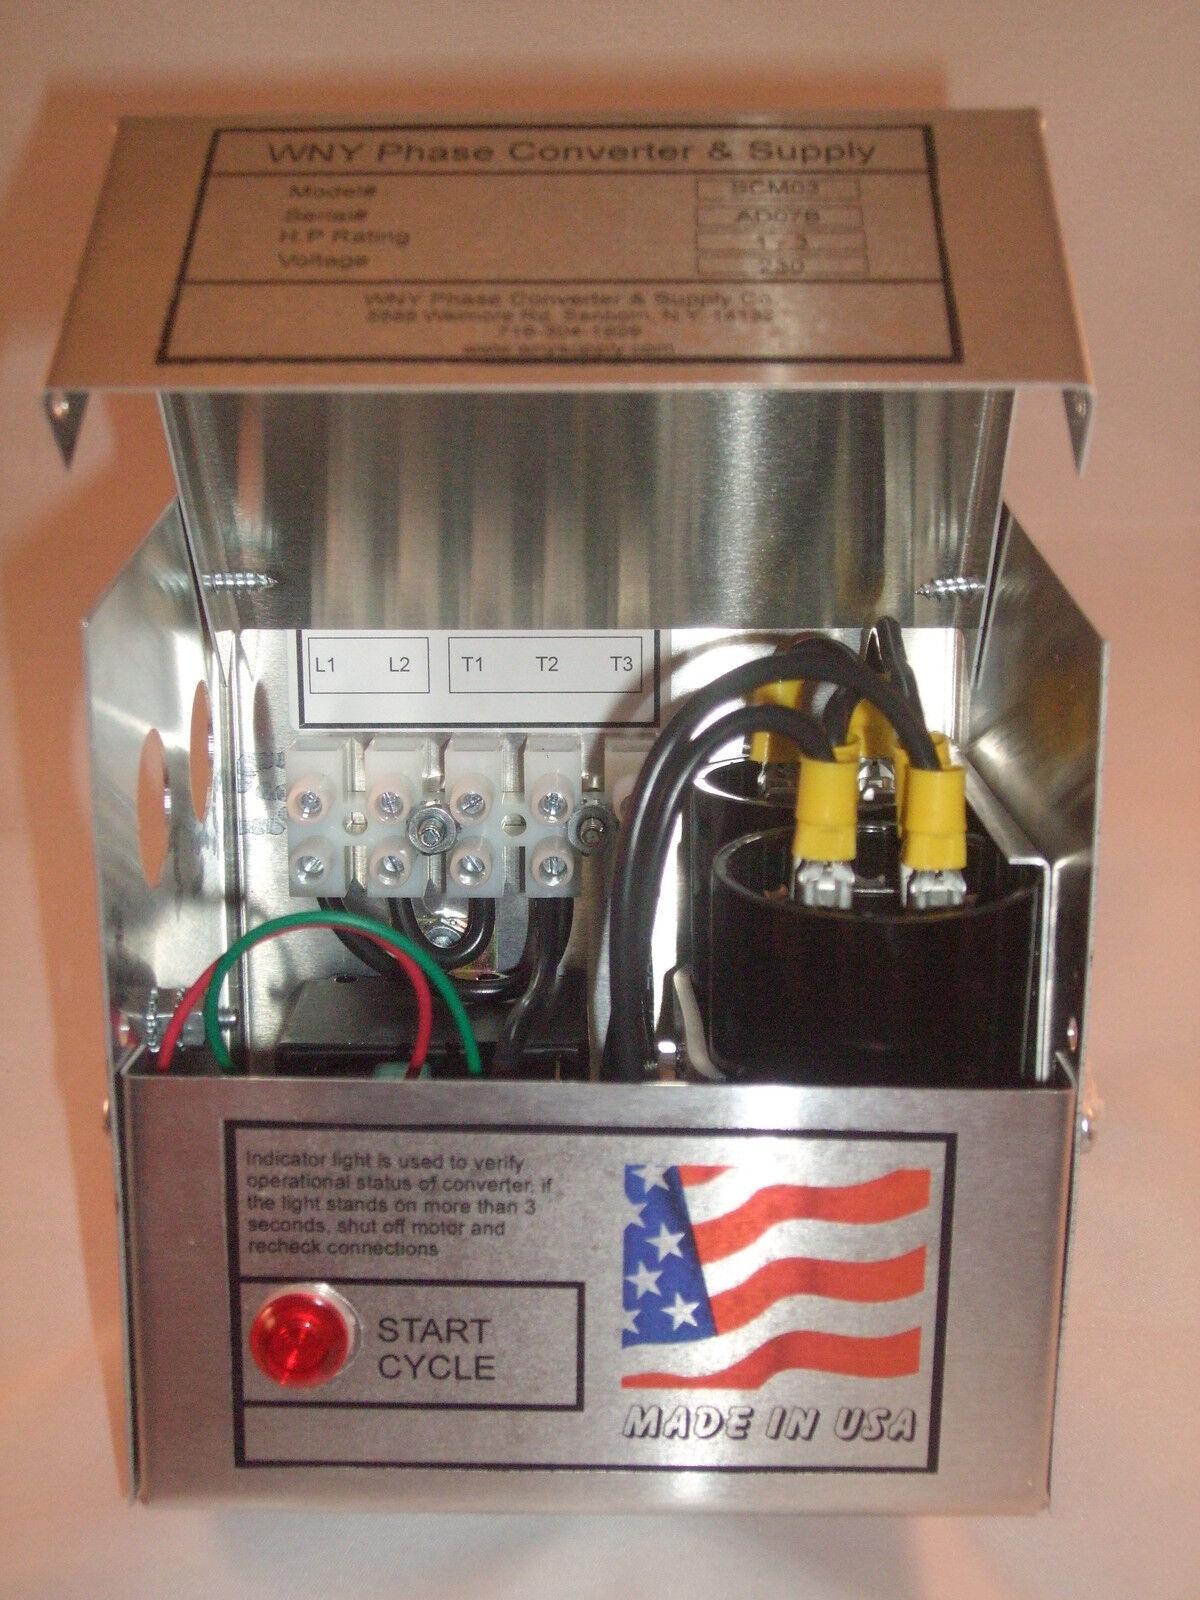 Heavy Duty 4-8 HP Static Phase Converter 208-250V Mill Drill IP65 60Day Warranty